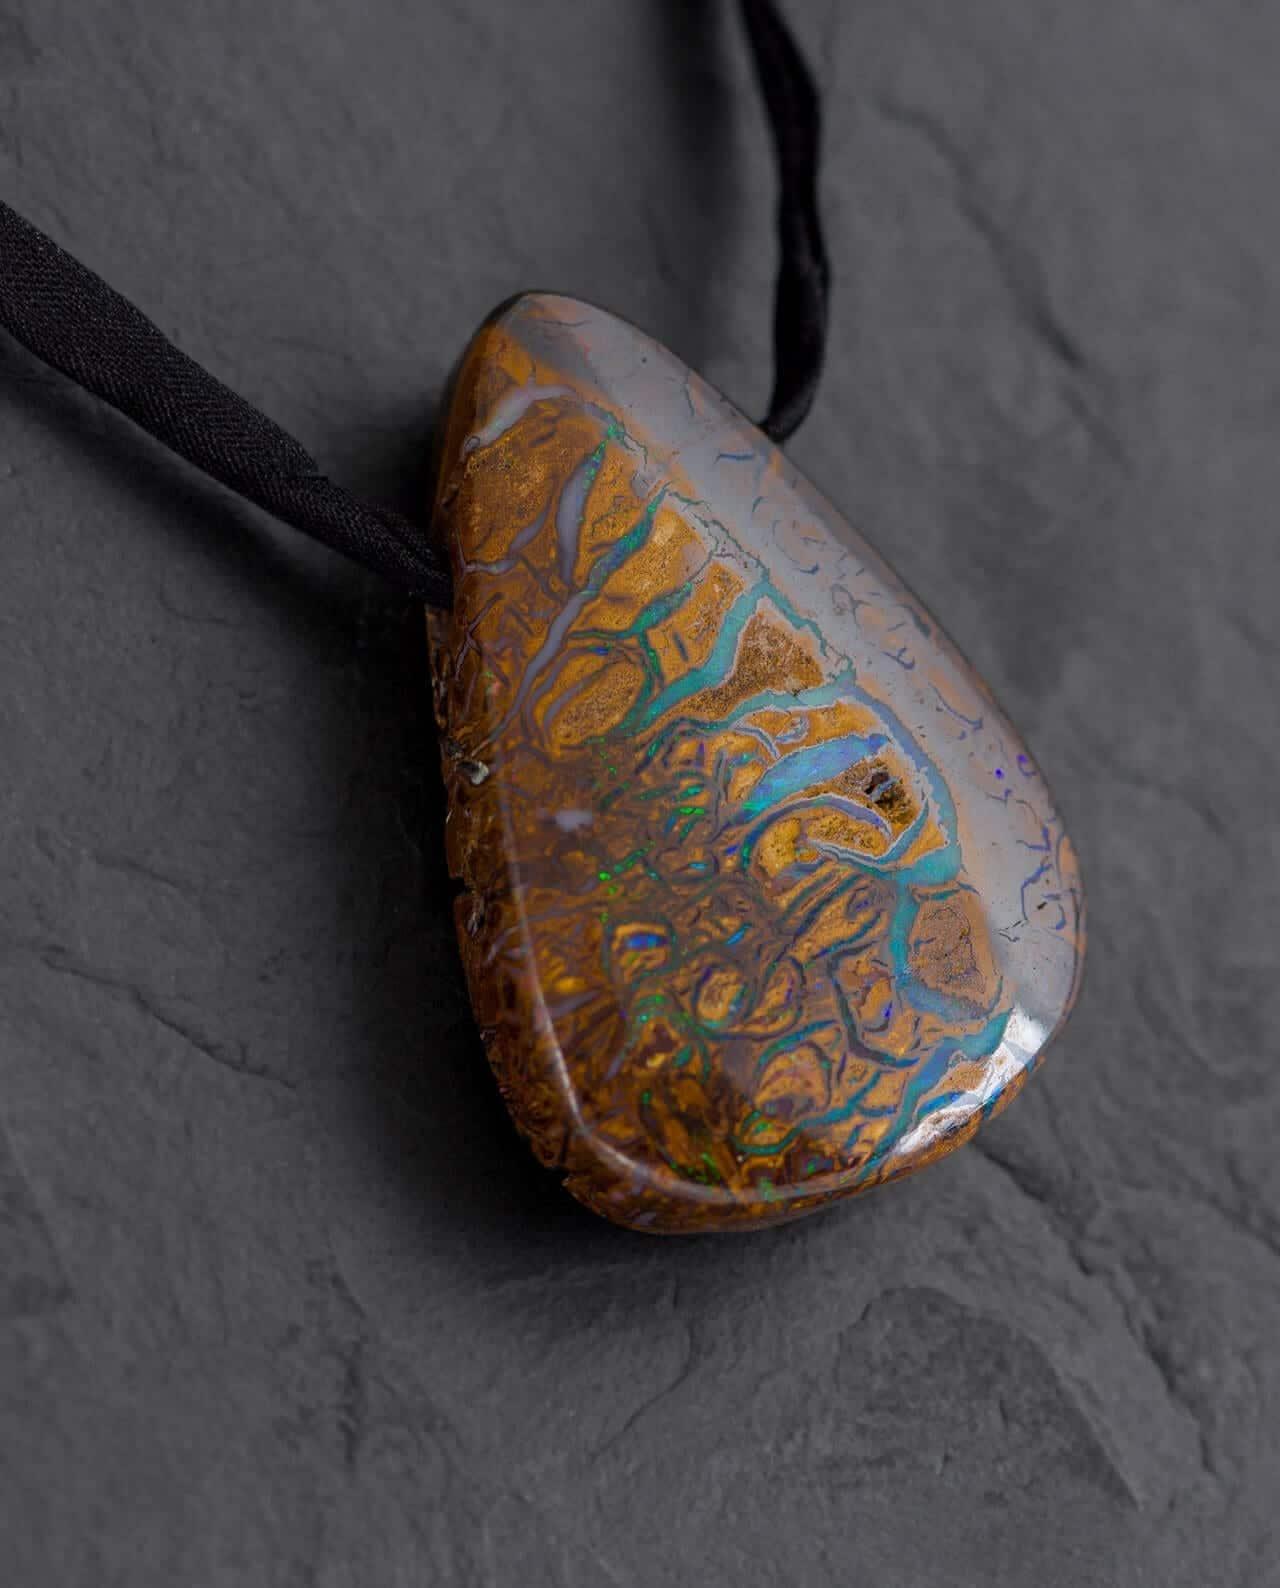 CONLIGHT Seltener Premium Boulder-Opal Anhaenger aus Queensland